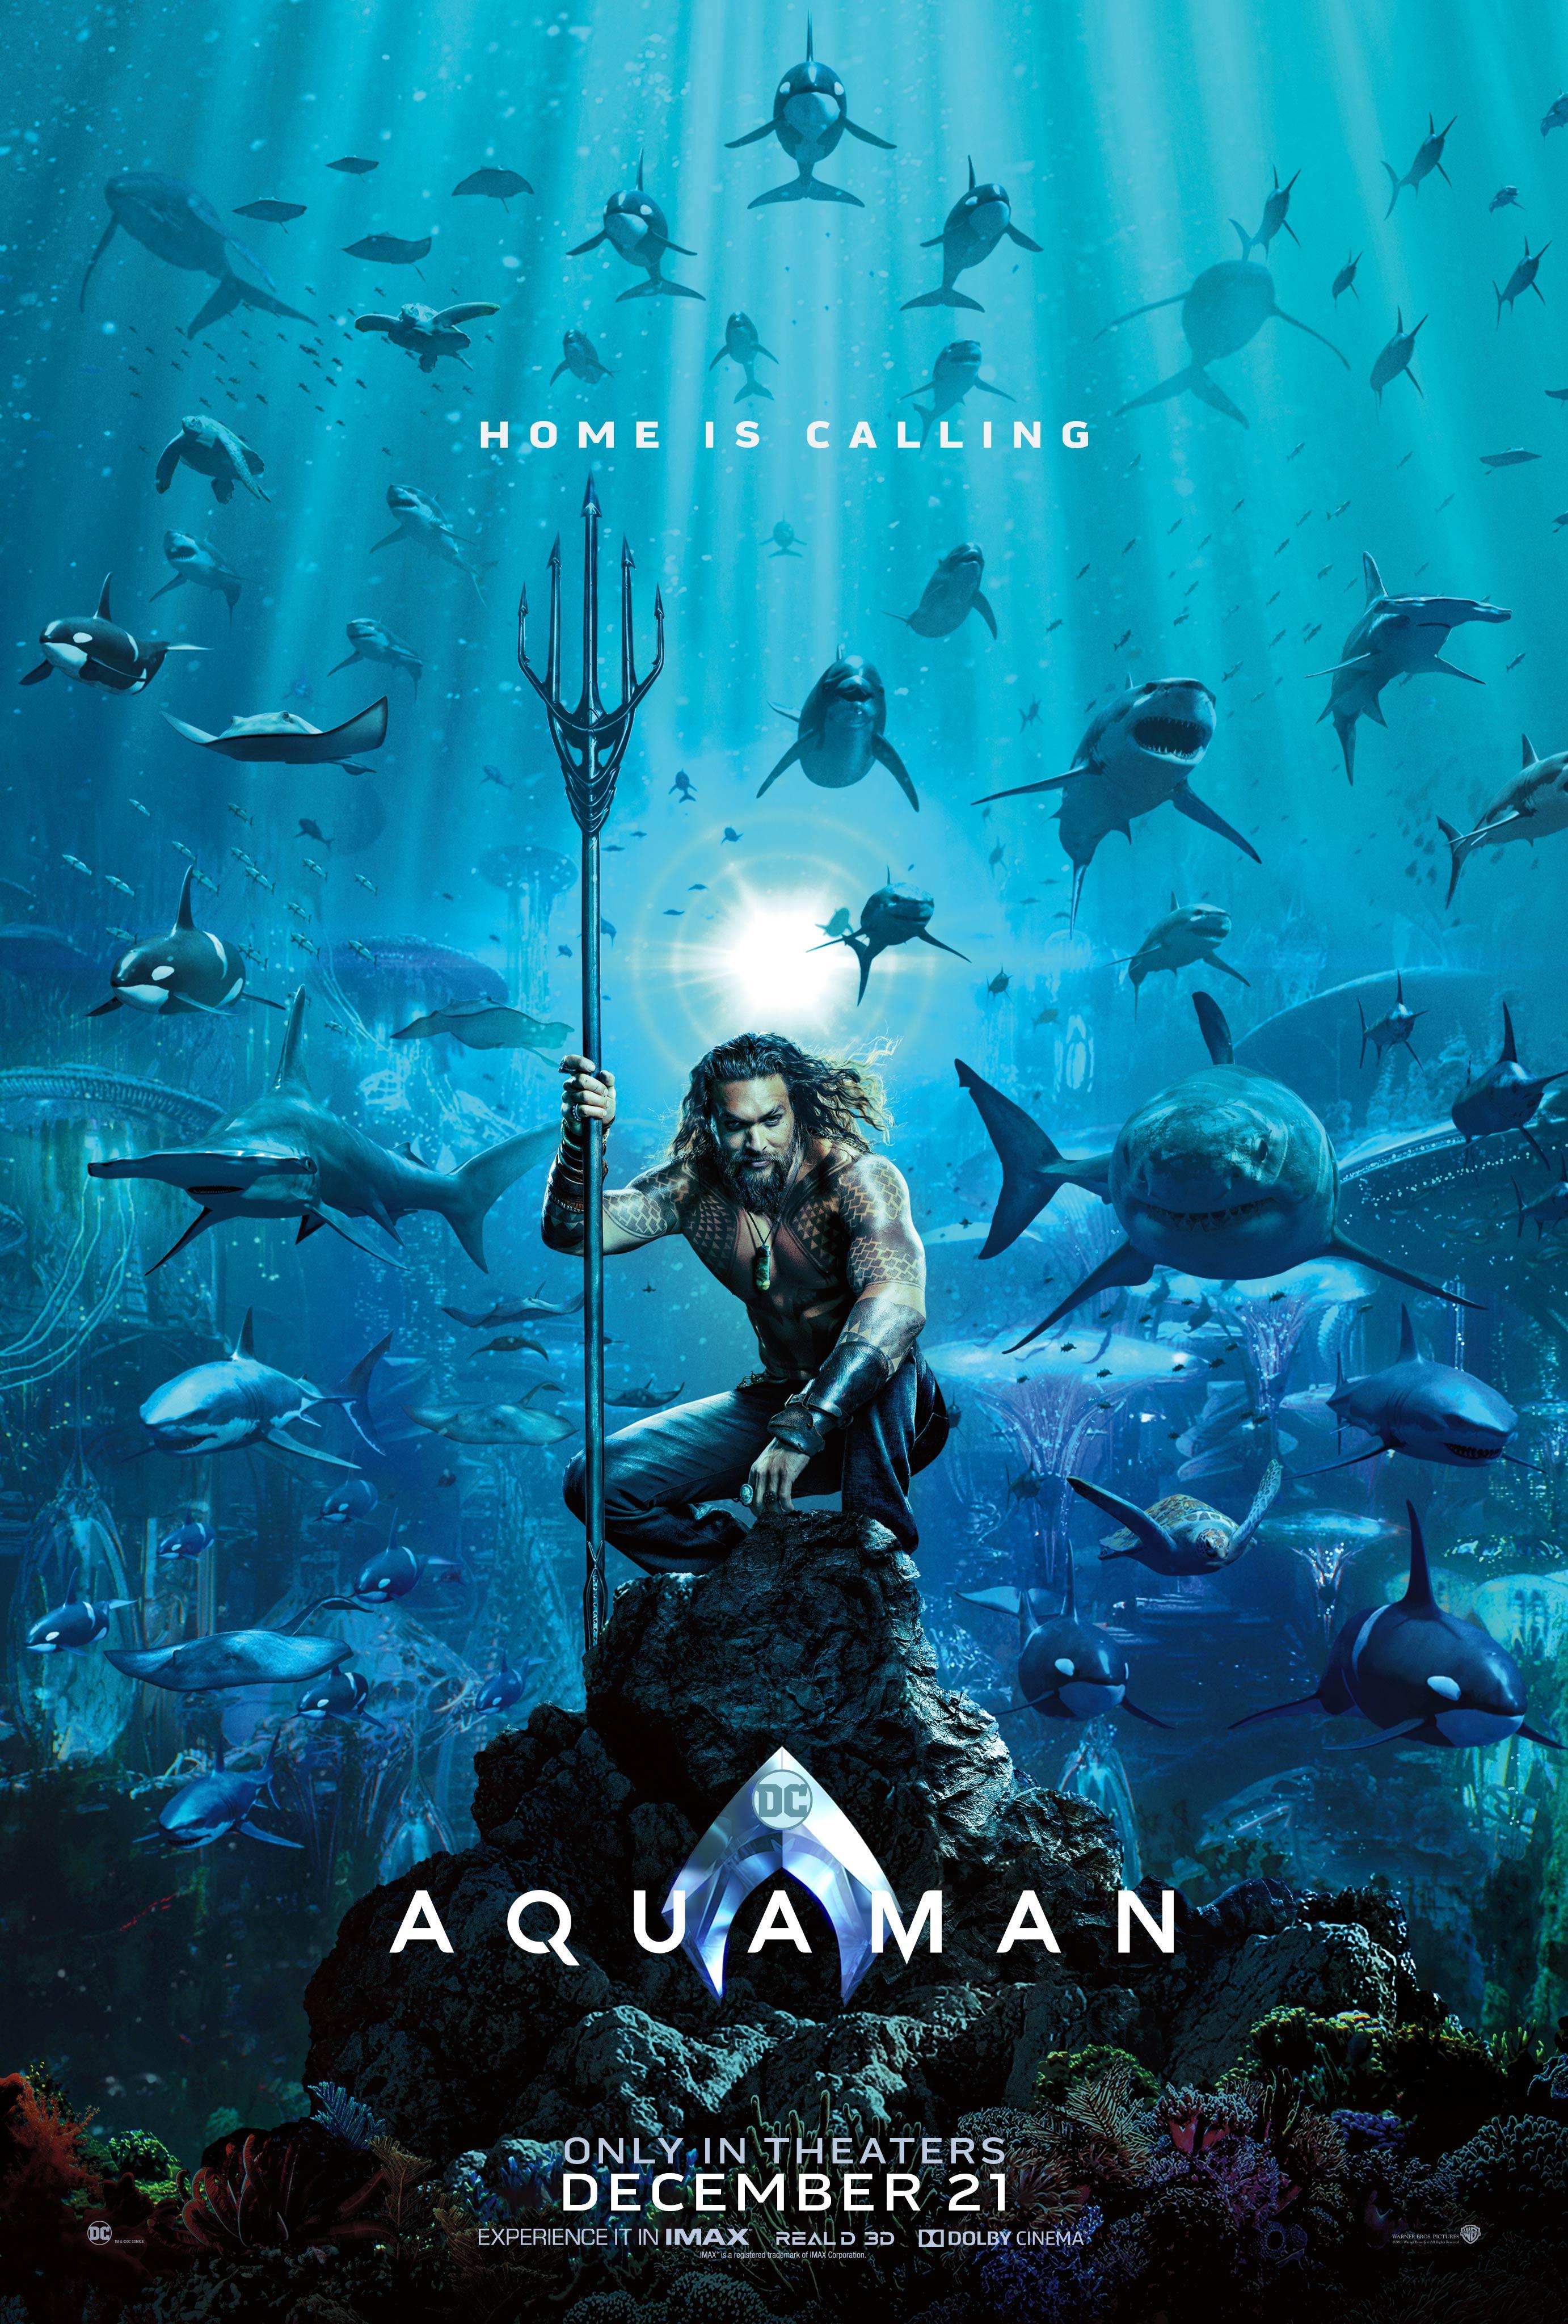 پوستر جدید فیلم آکوامن